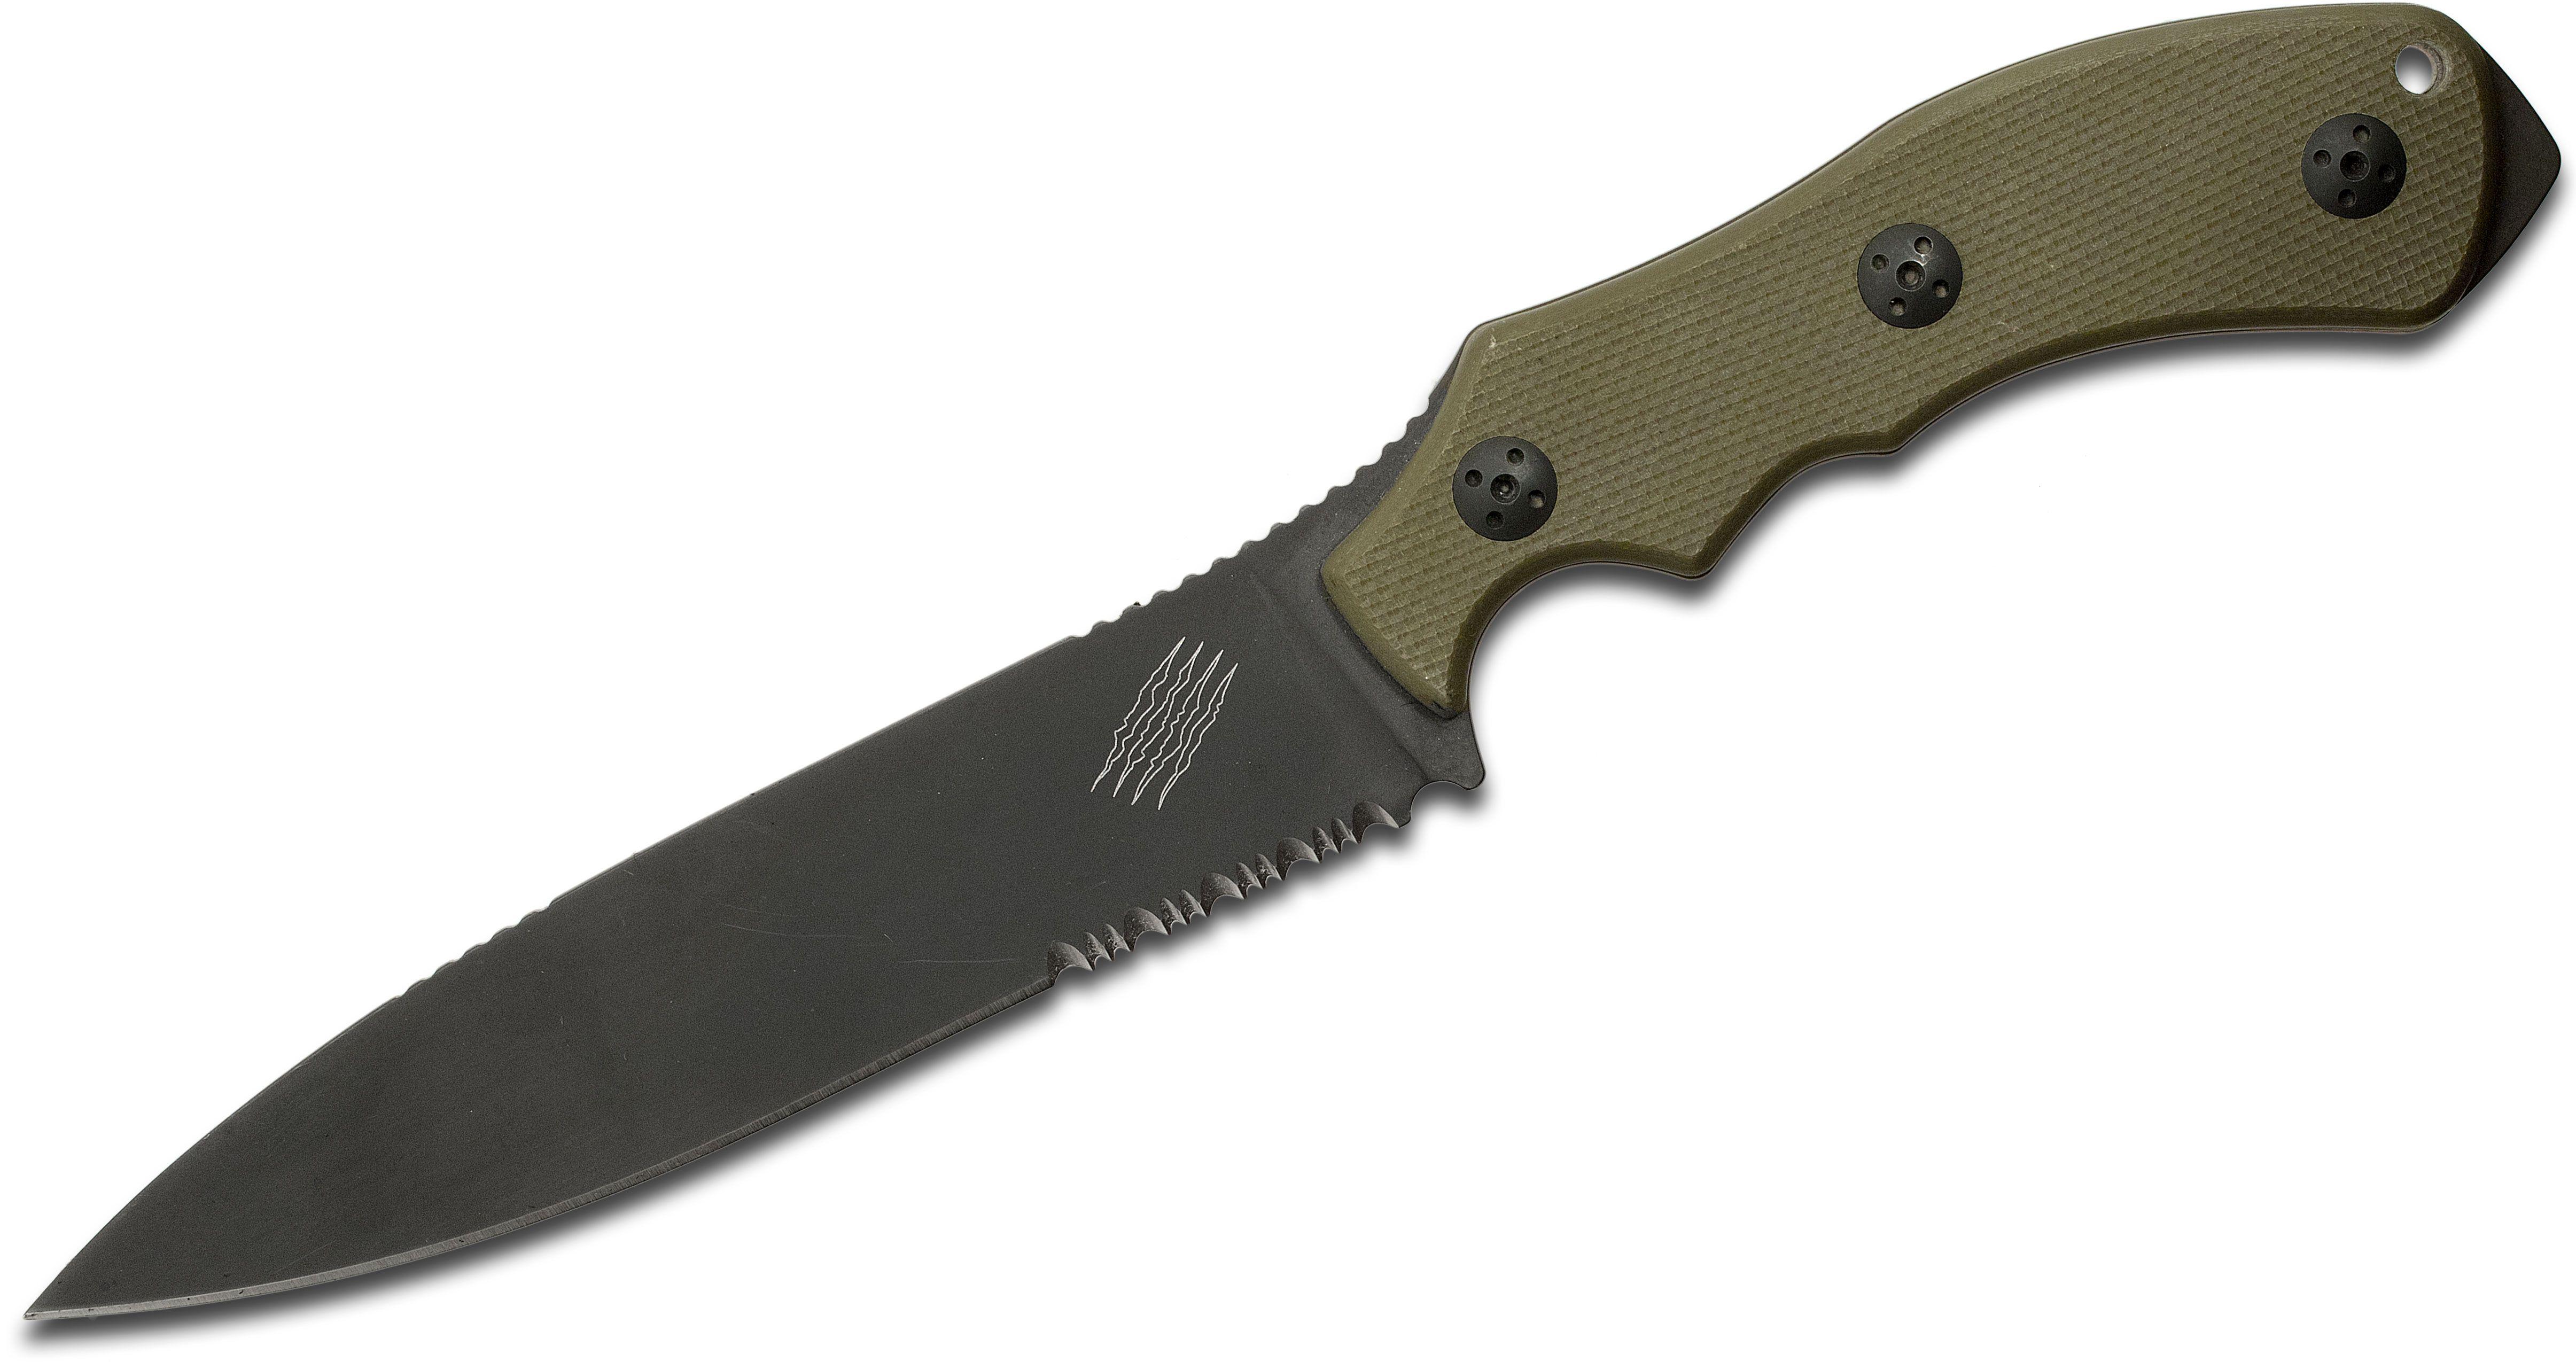 Bastinelli Creations GT6 Origin Fixed 5.51 inch Black D2 Combo Blade, OD Green G10 Handles, Kydex Sheath